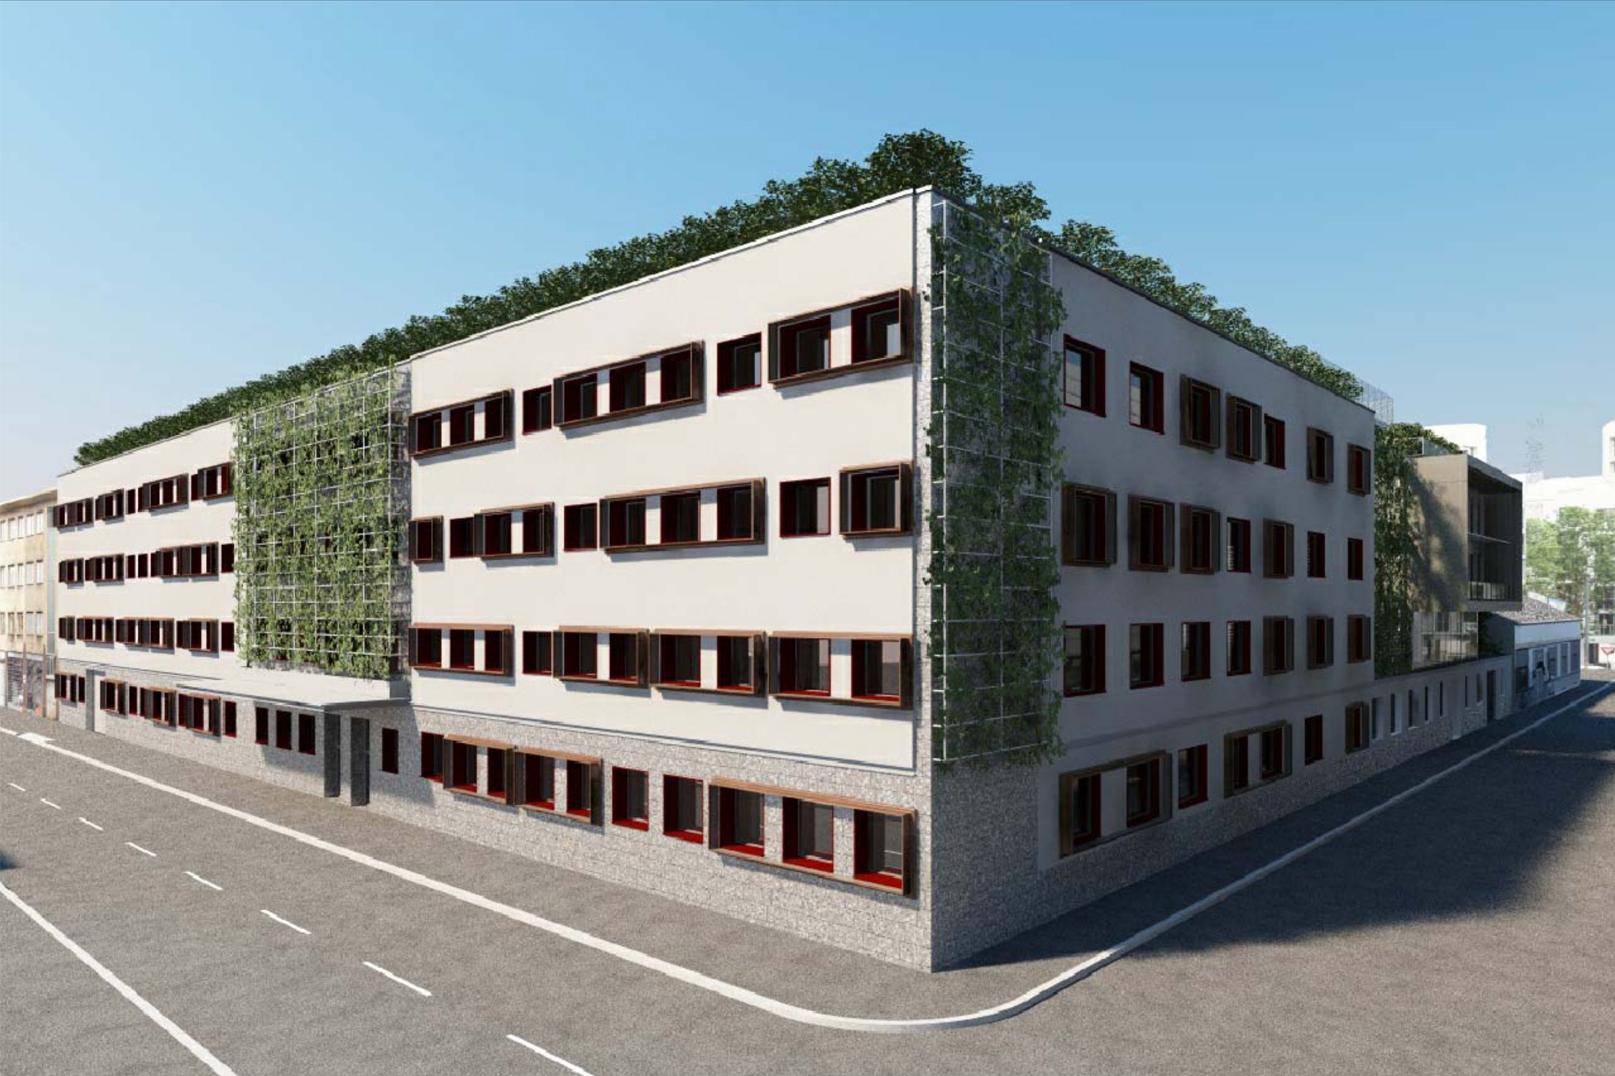 Thumbnail Edificio Uffici - Bernina / 1